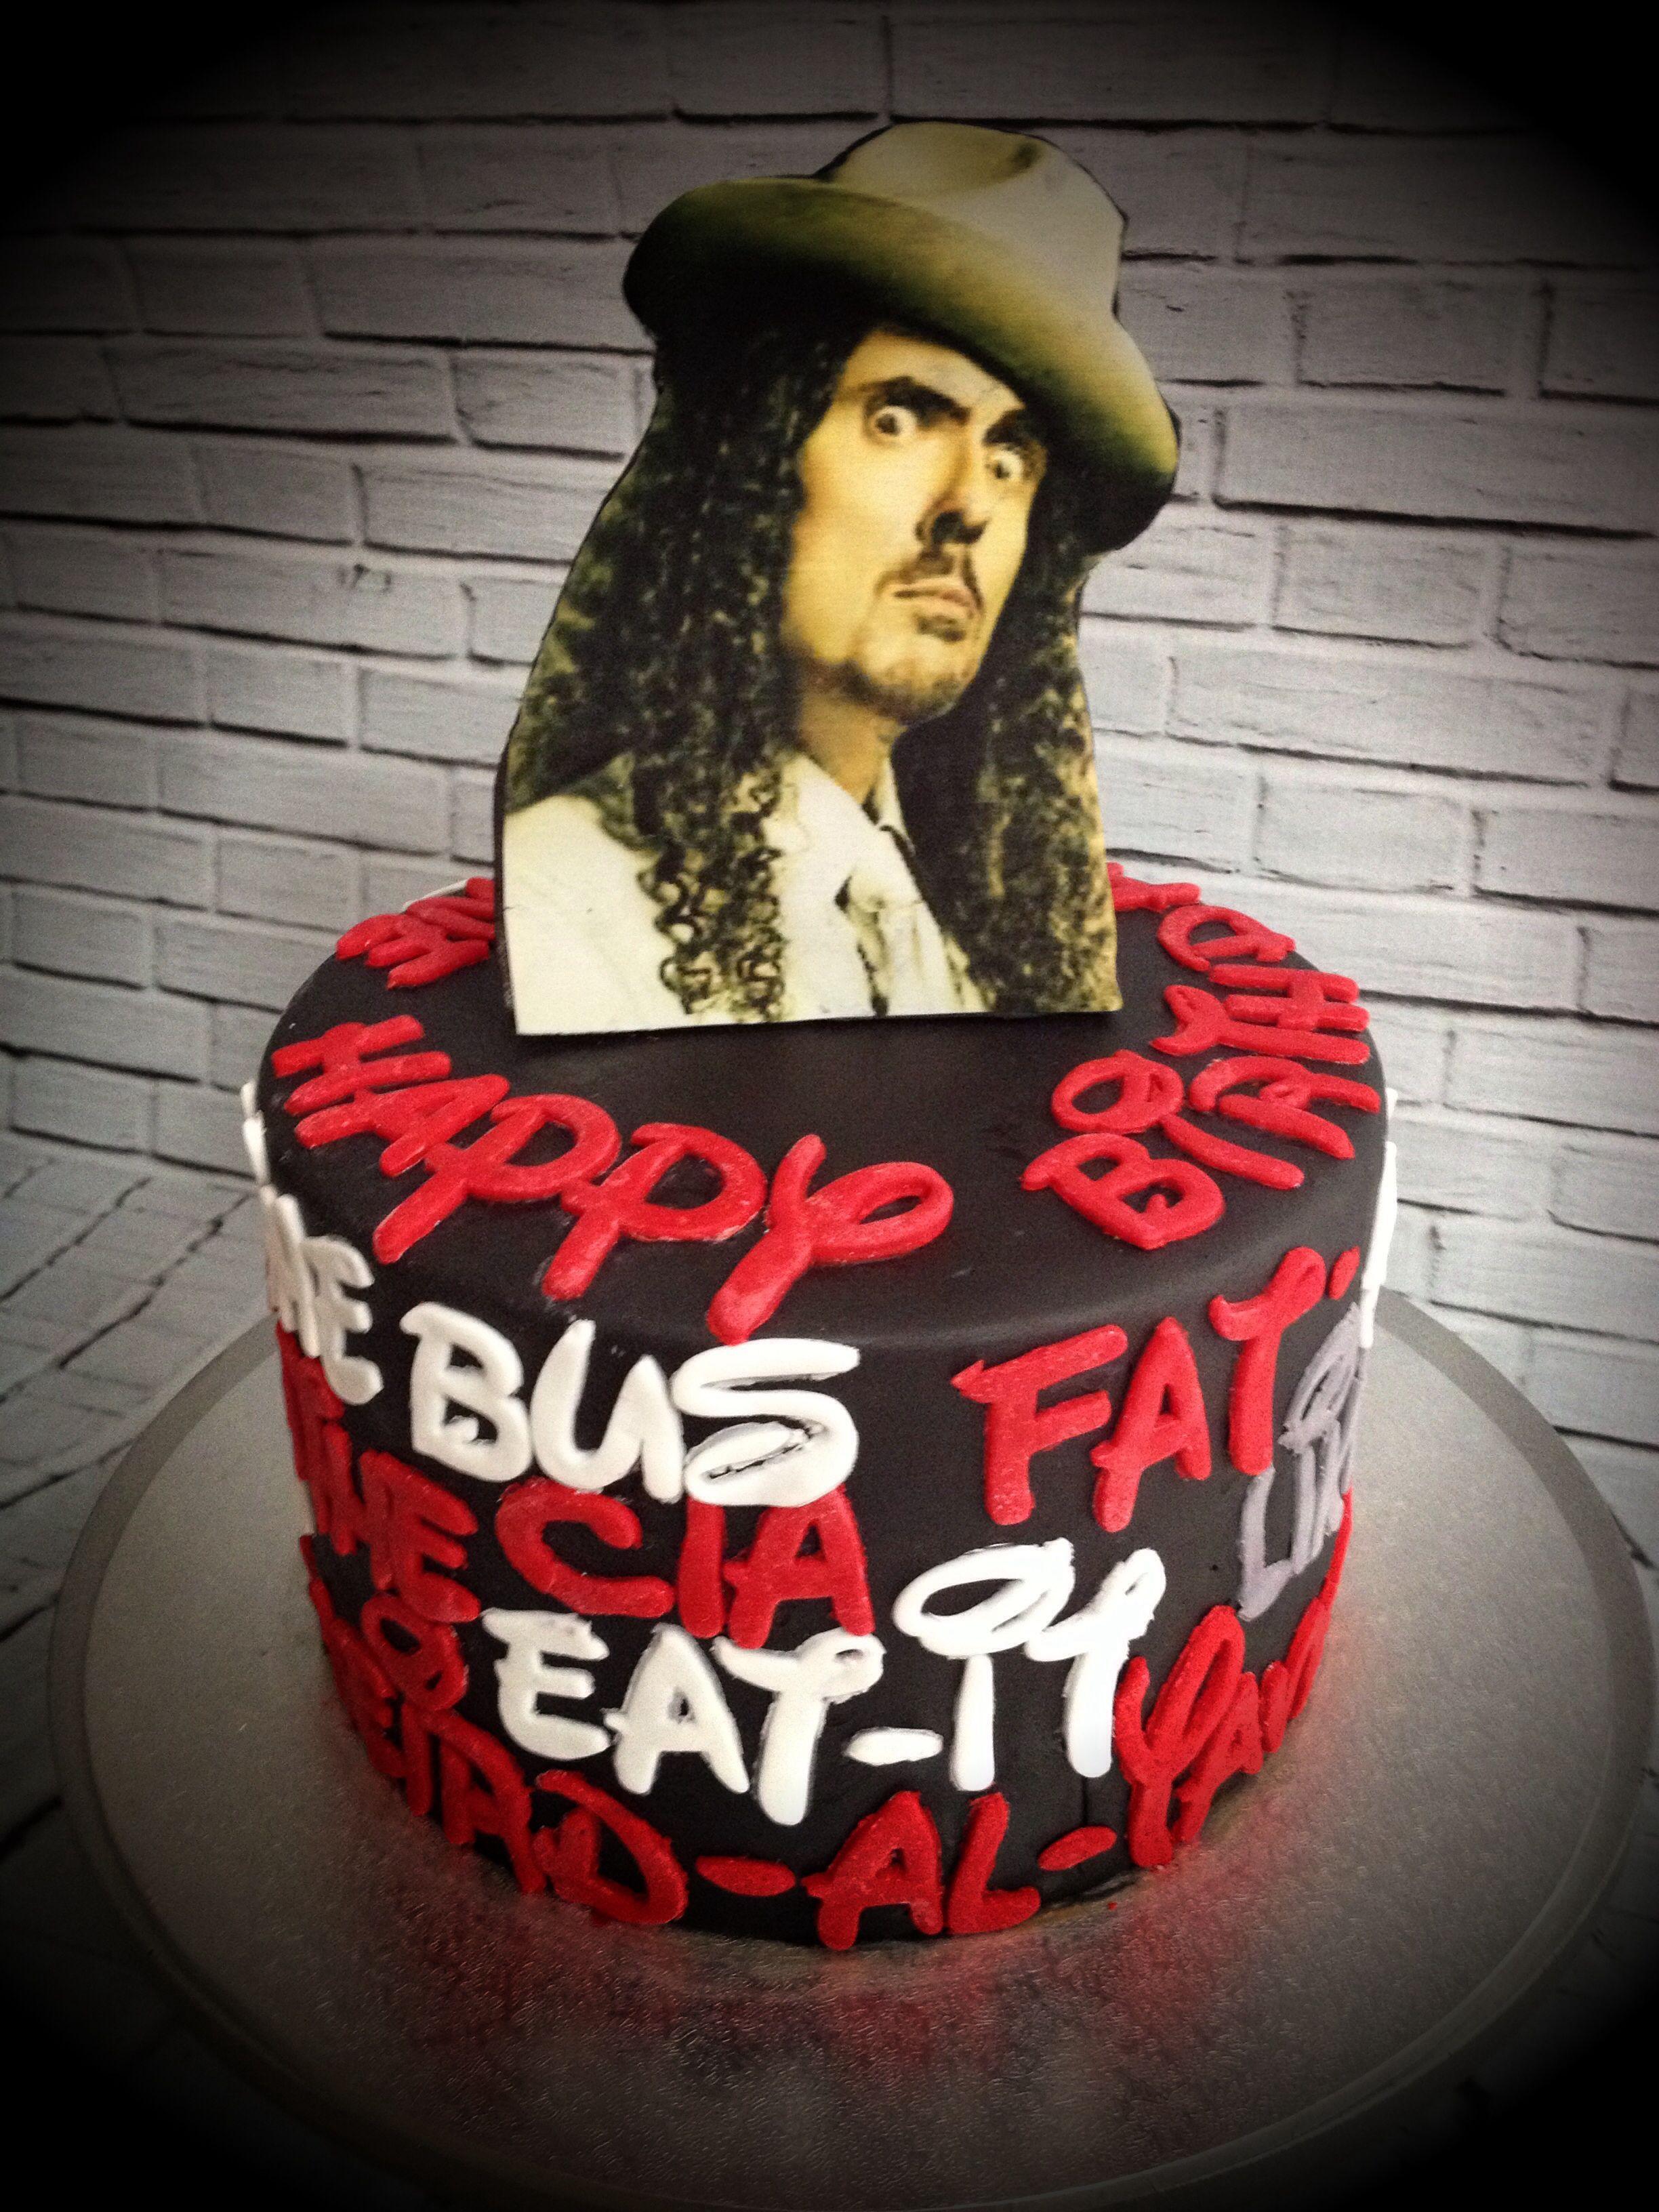 Weird Al Yankovic Cake Birthday Cake Pinterest Cake Birthday